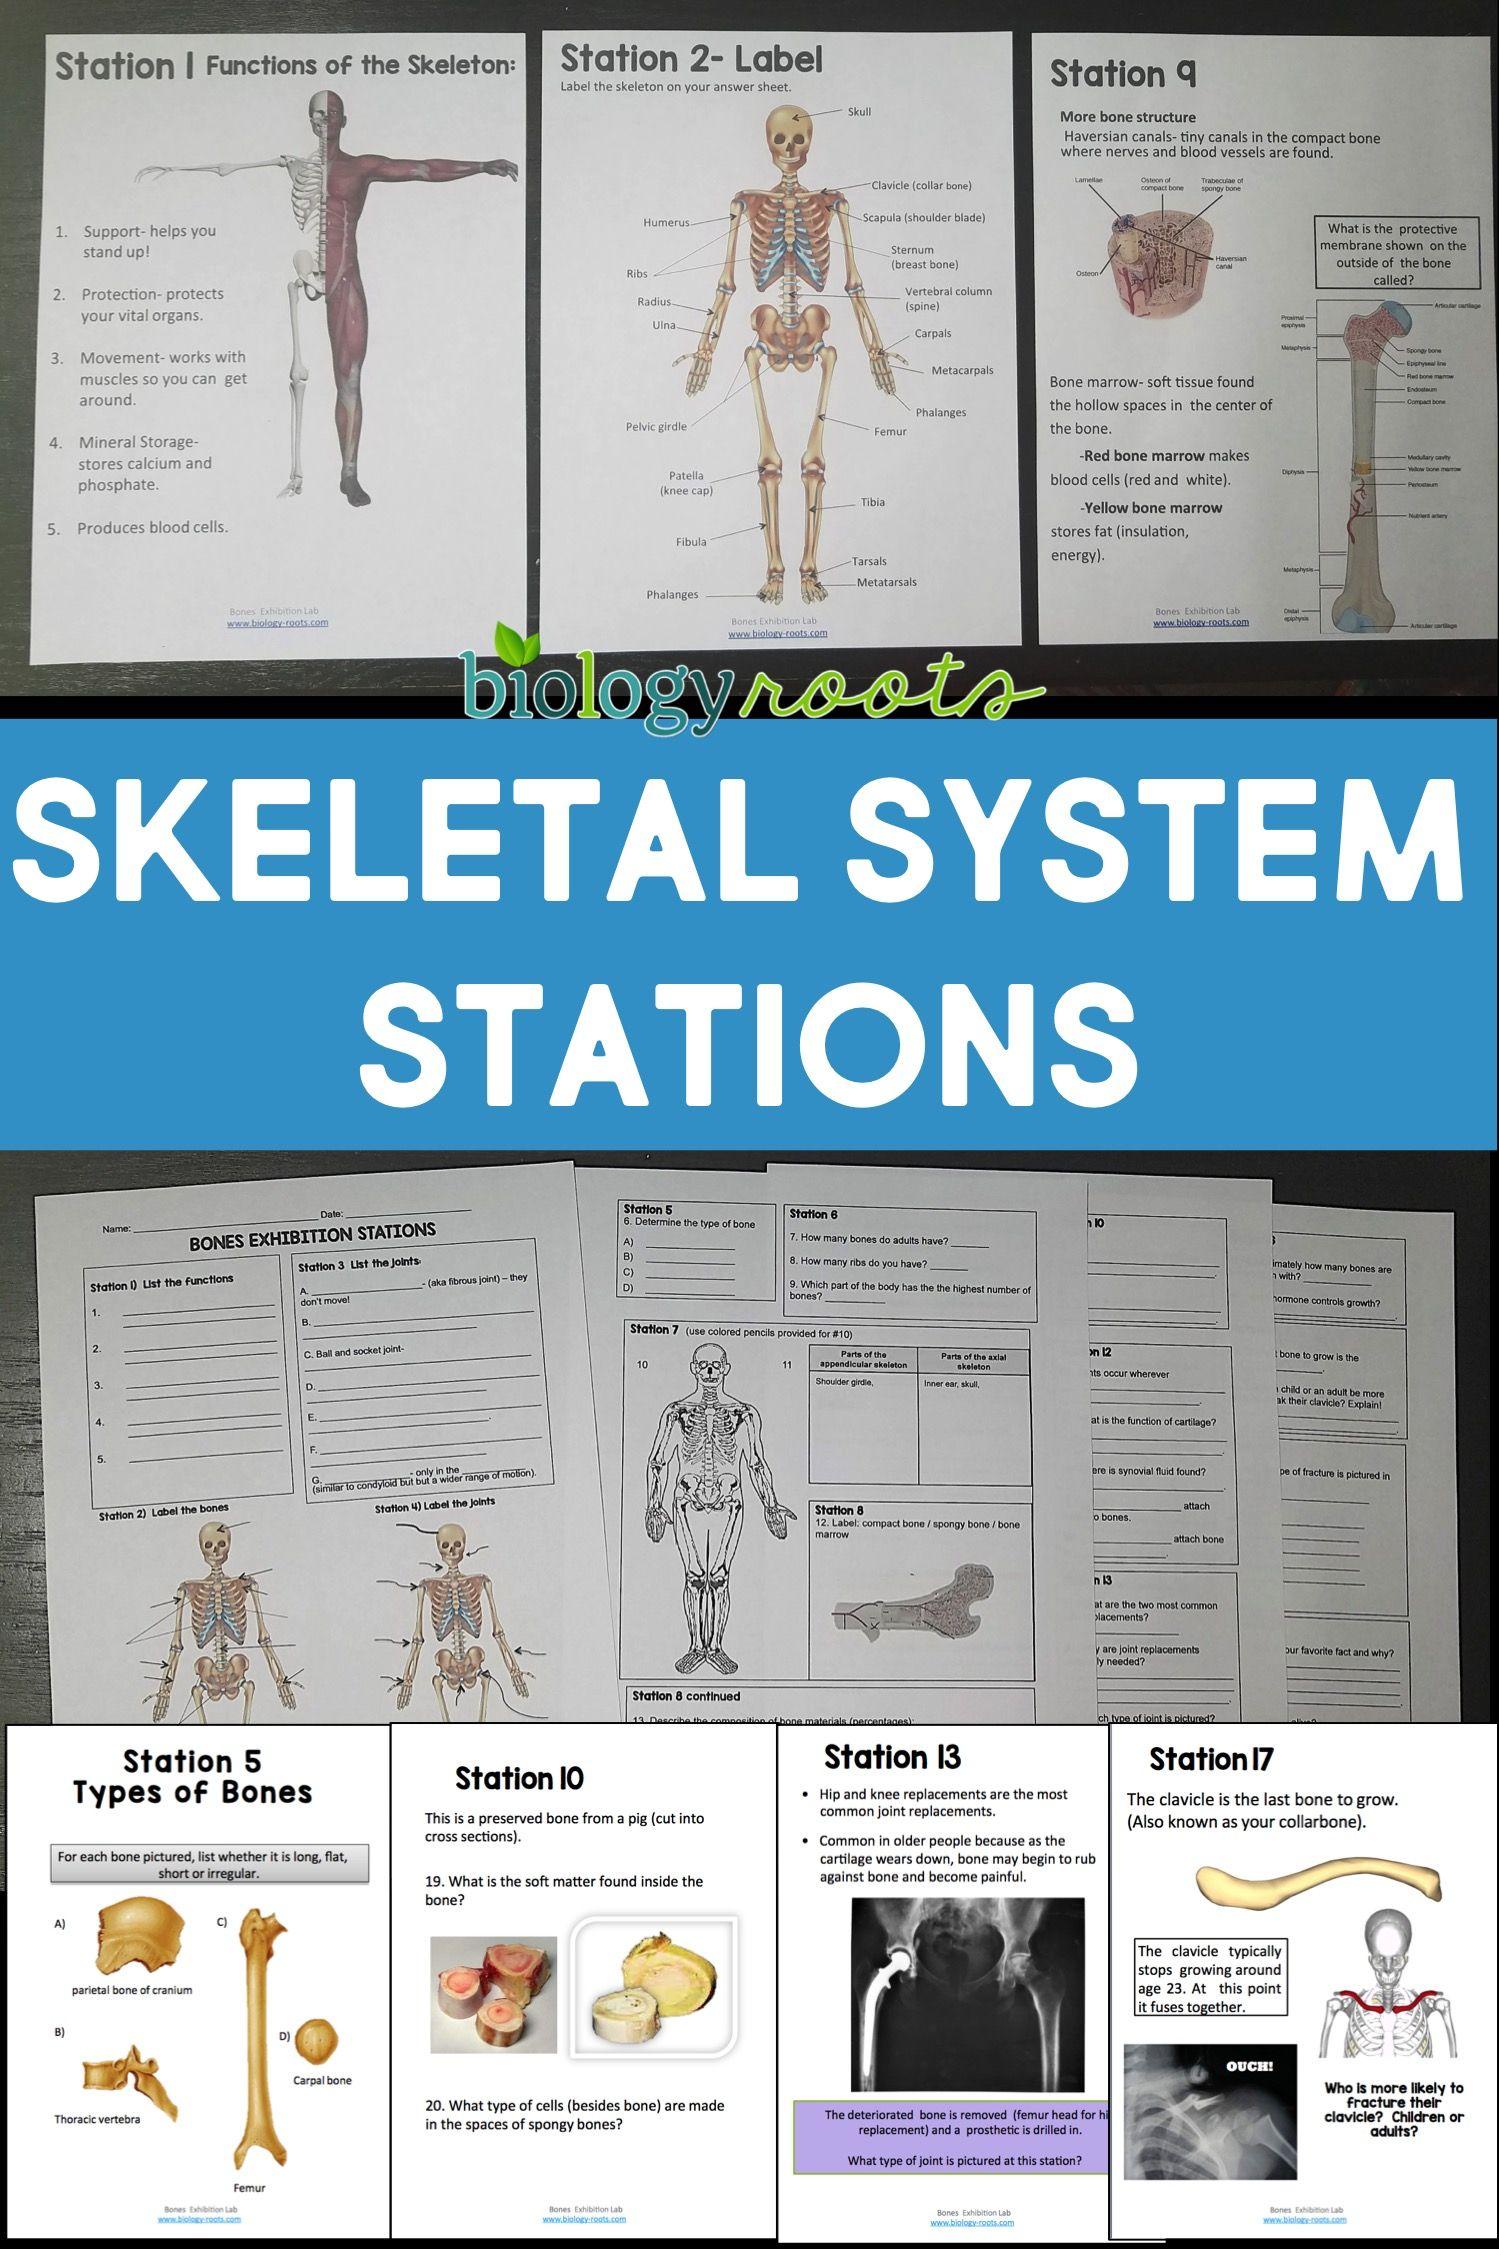 Skeletal System Exhibition Lab Stations